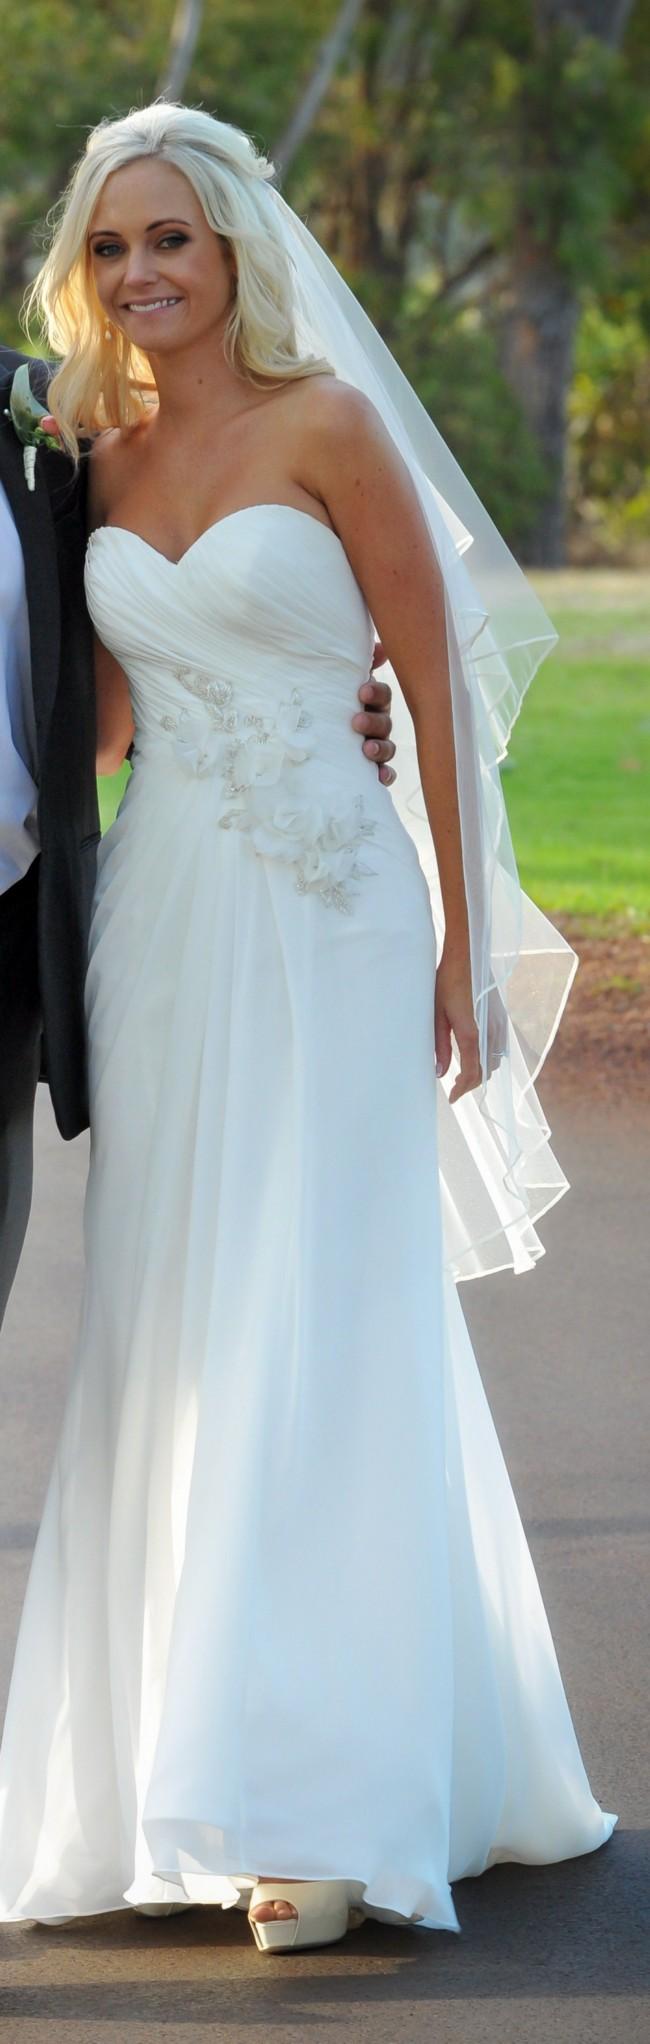 Beautiful J Crew Wedding Dress Sale Mold - All Wedding Dresses ...